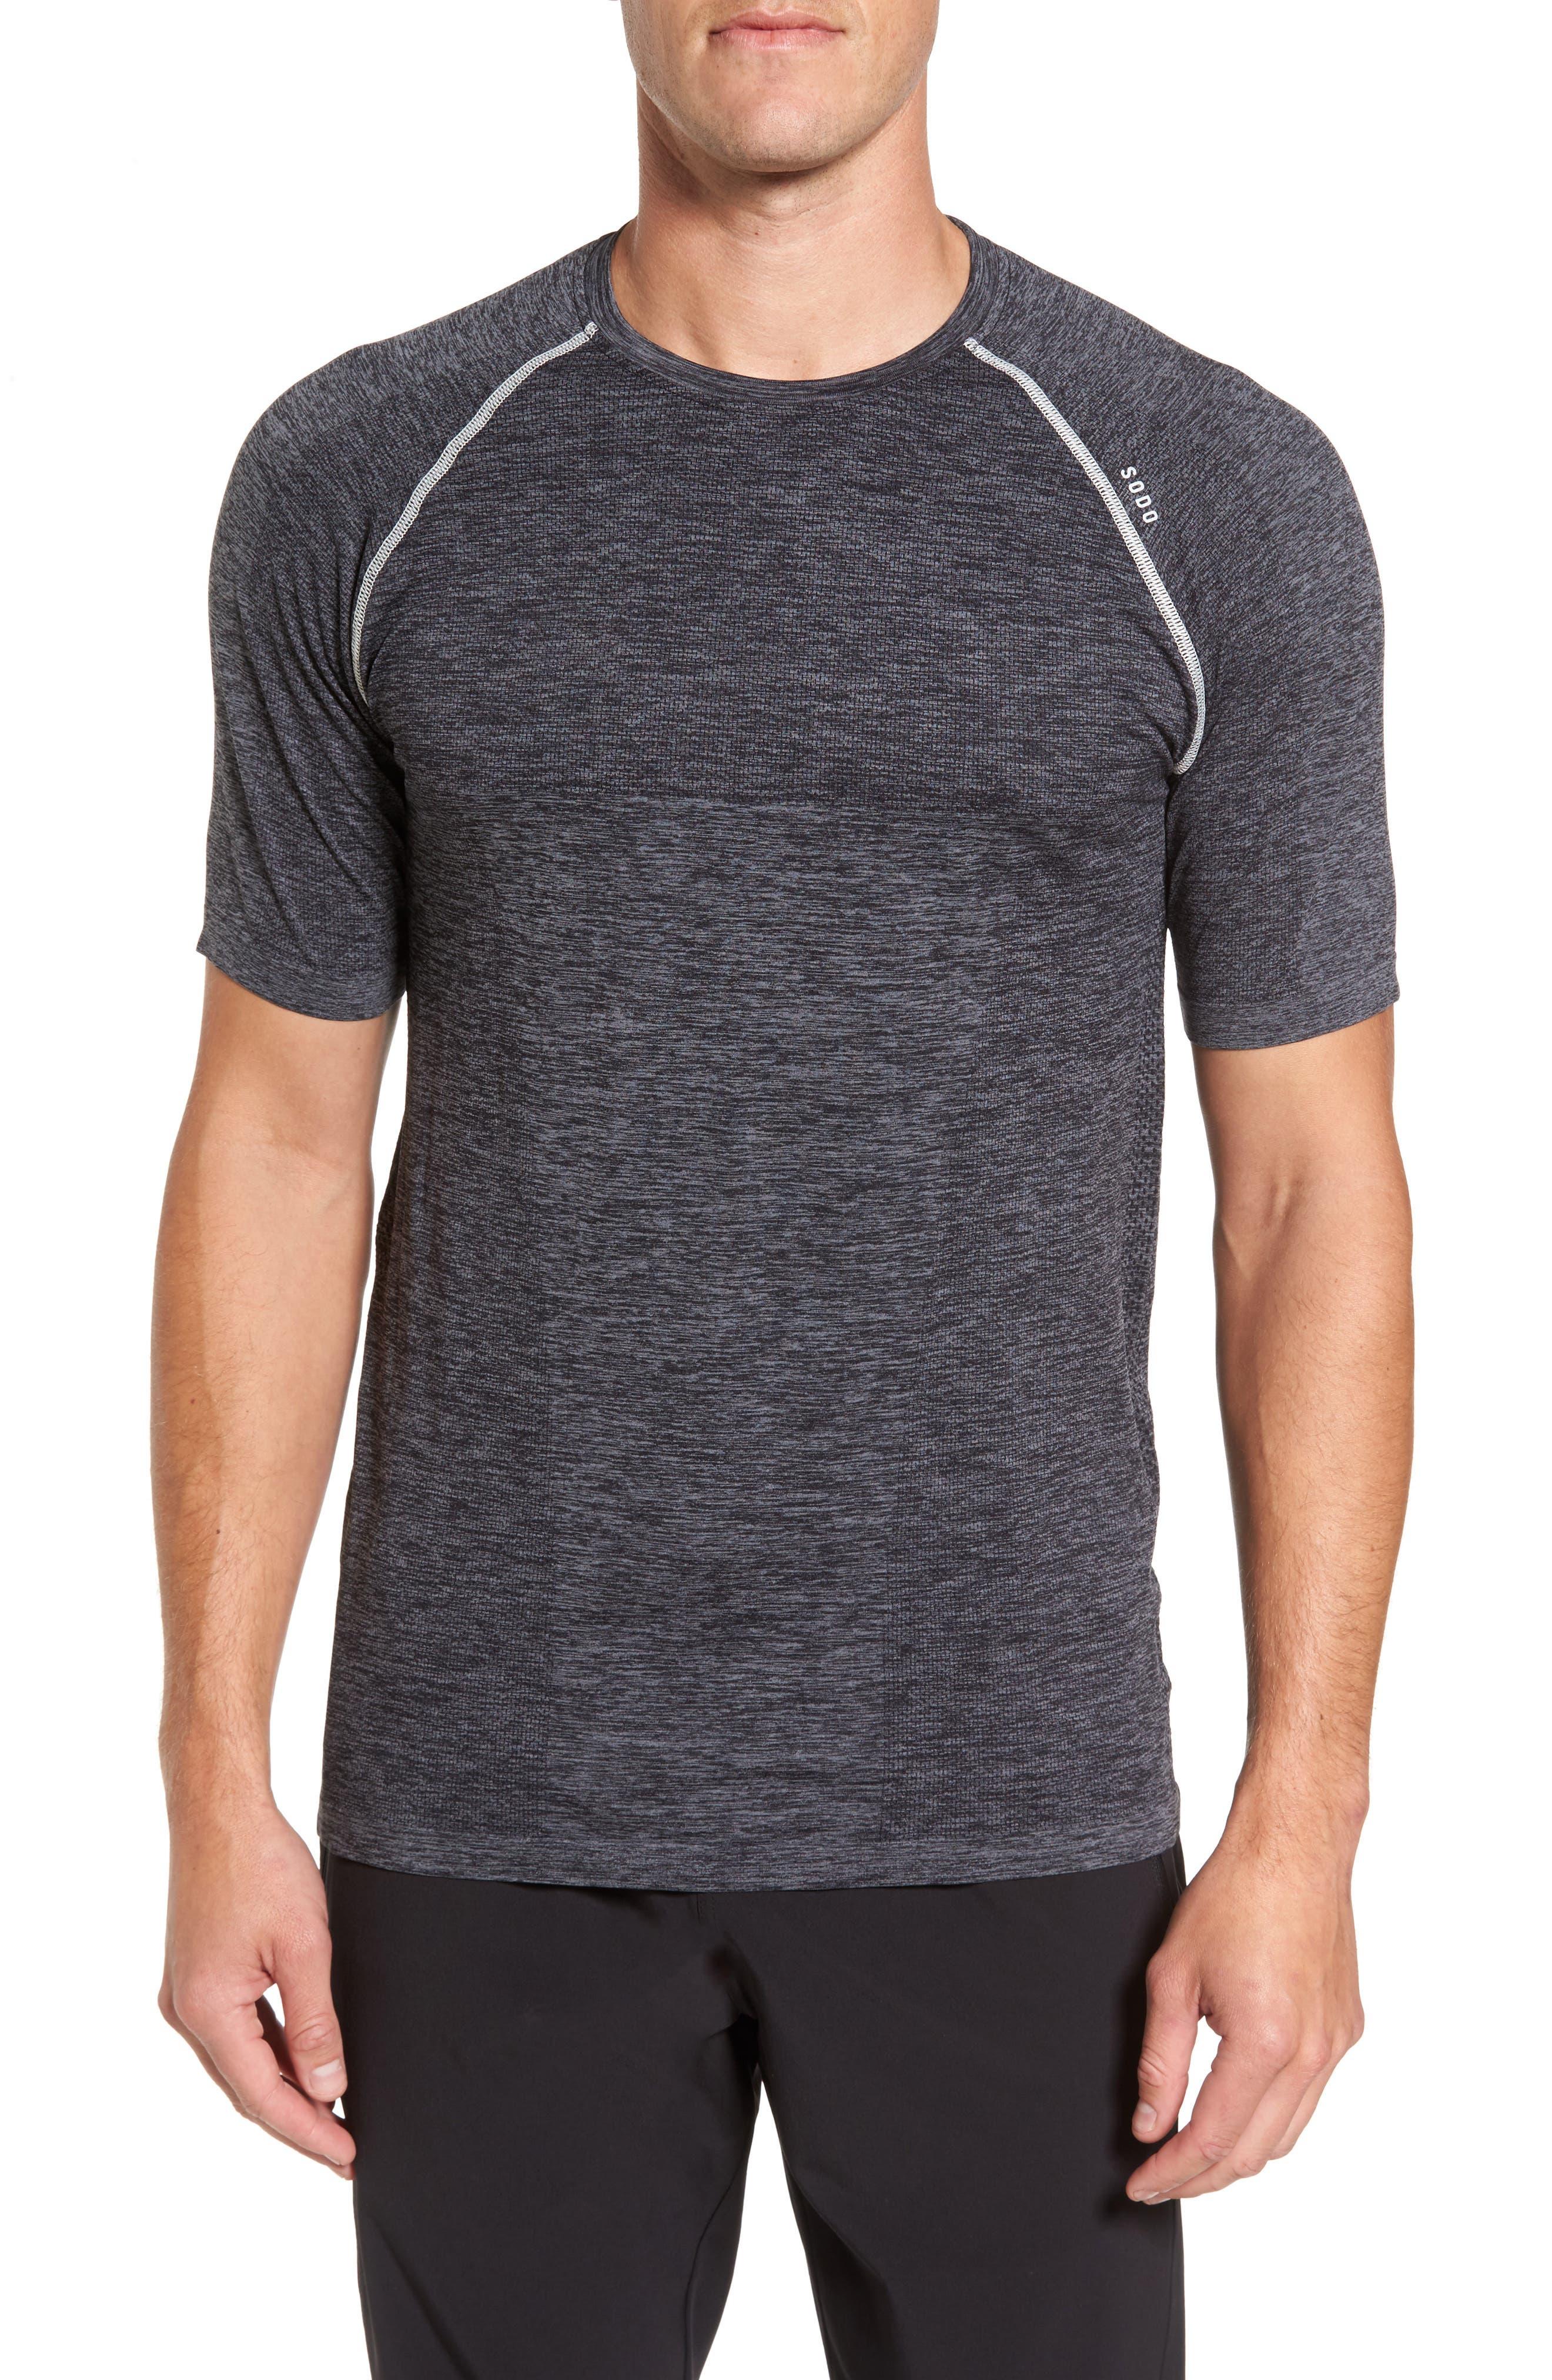 Main Image - SODO Seamless Crewneck Performance T-Shirt